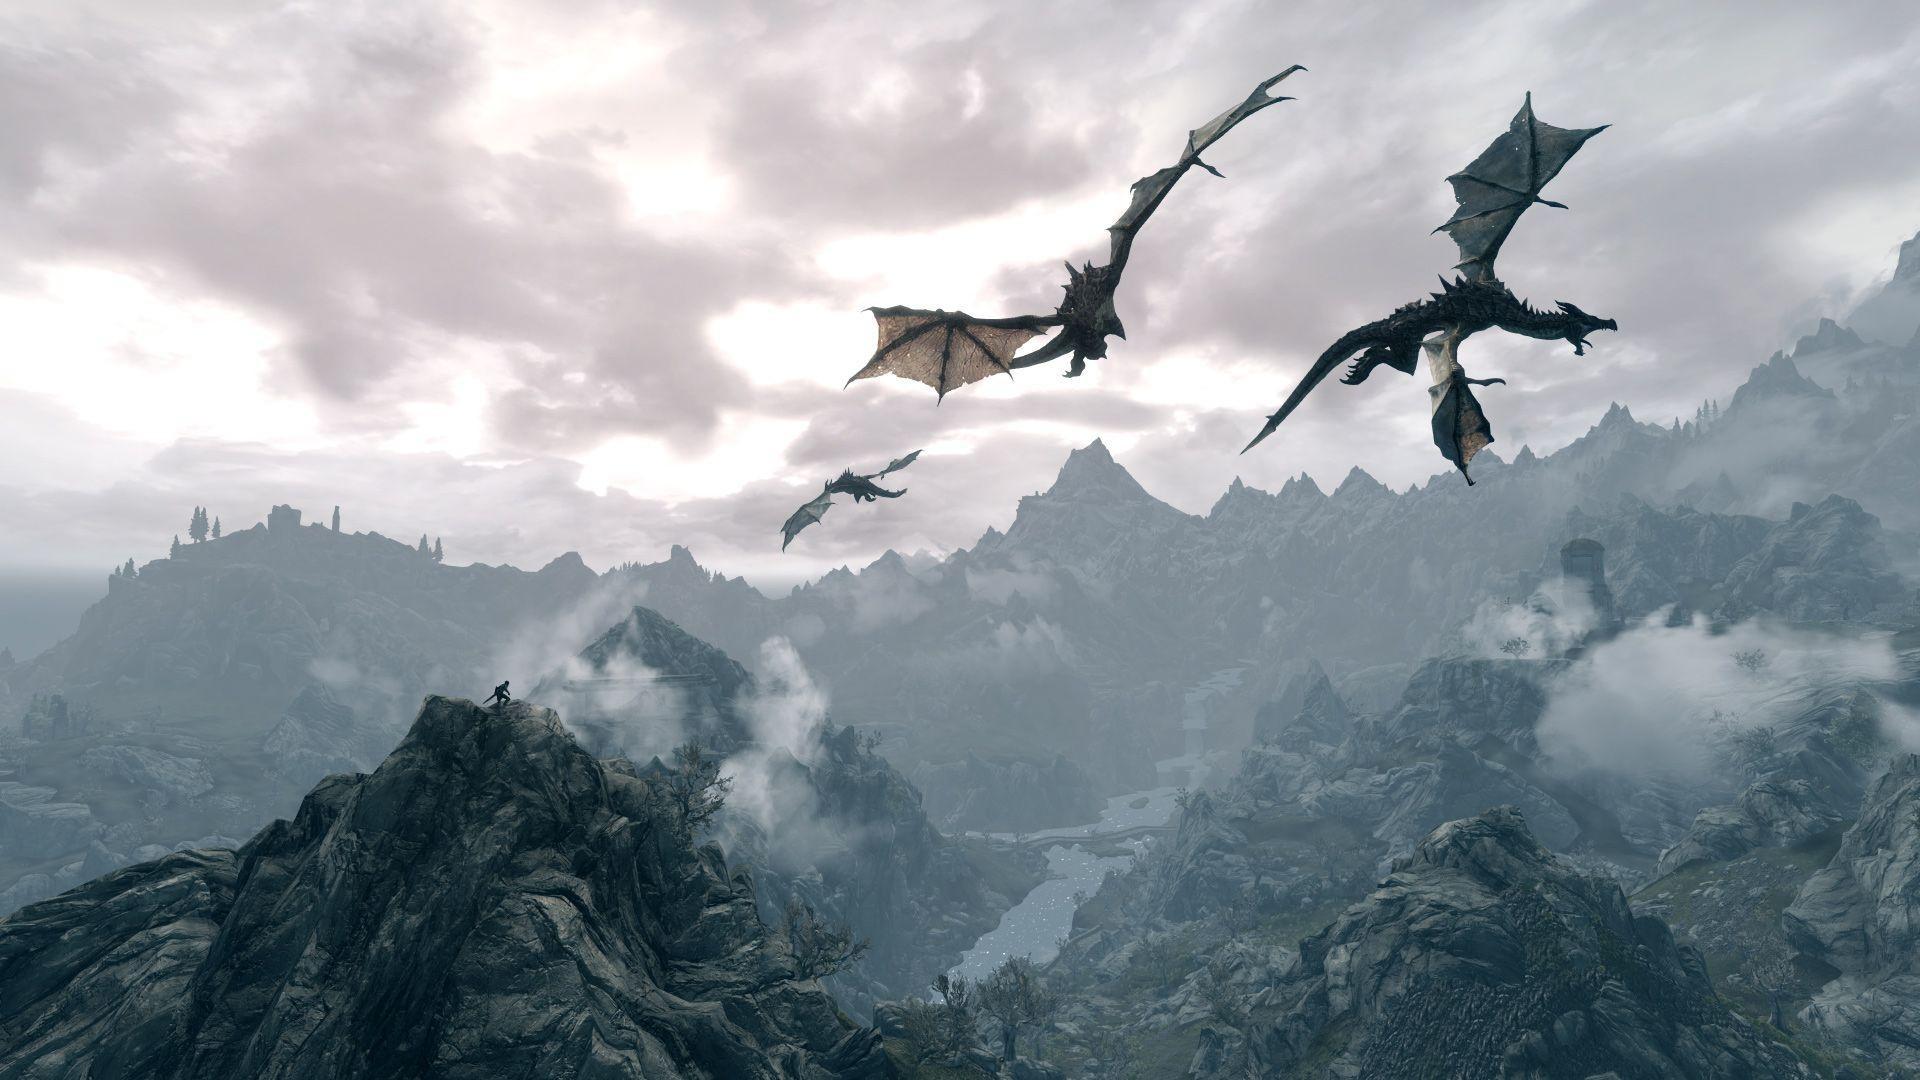 Wallpapers For > Skyrim Dragon Wallpaper Widescreen